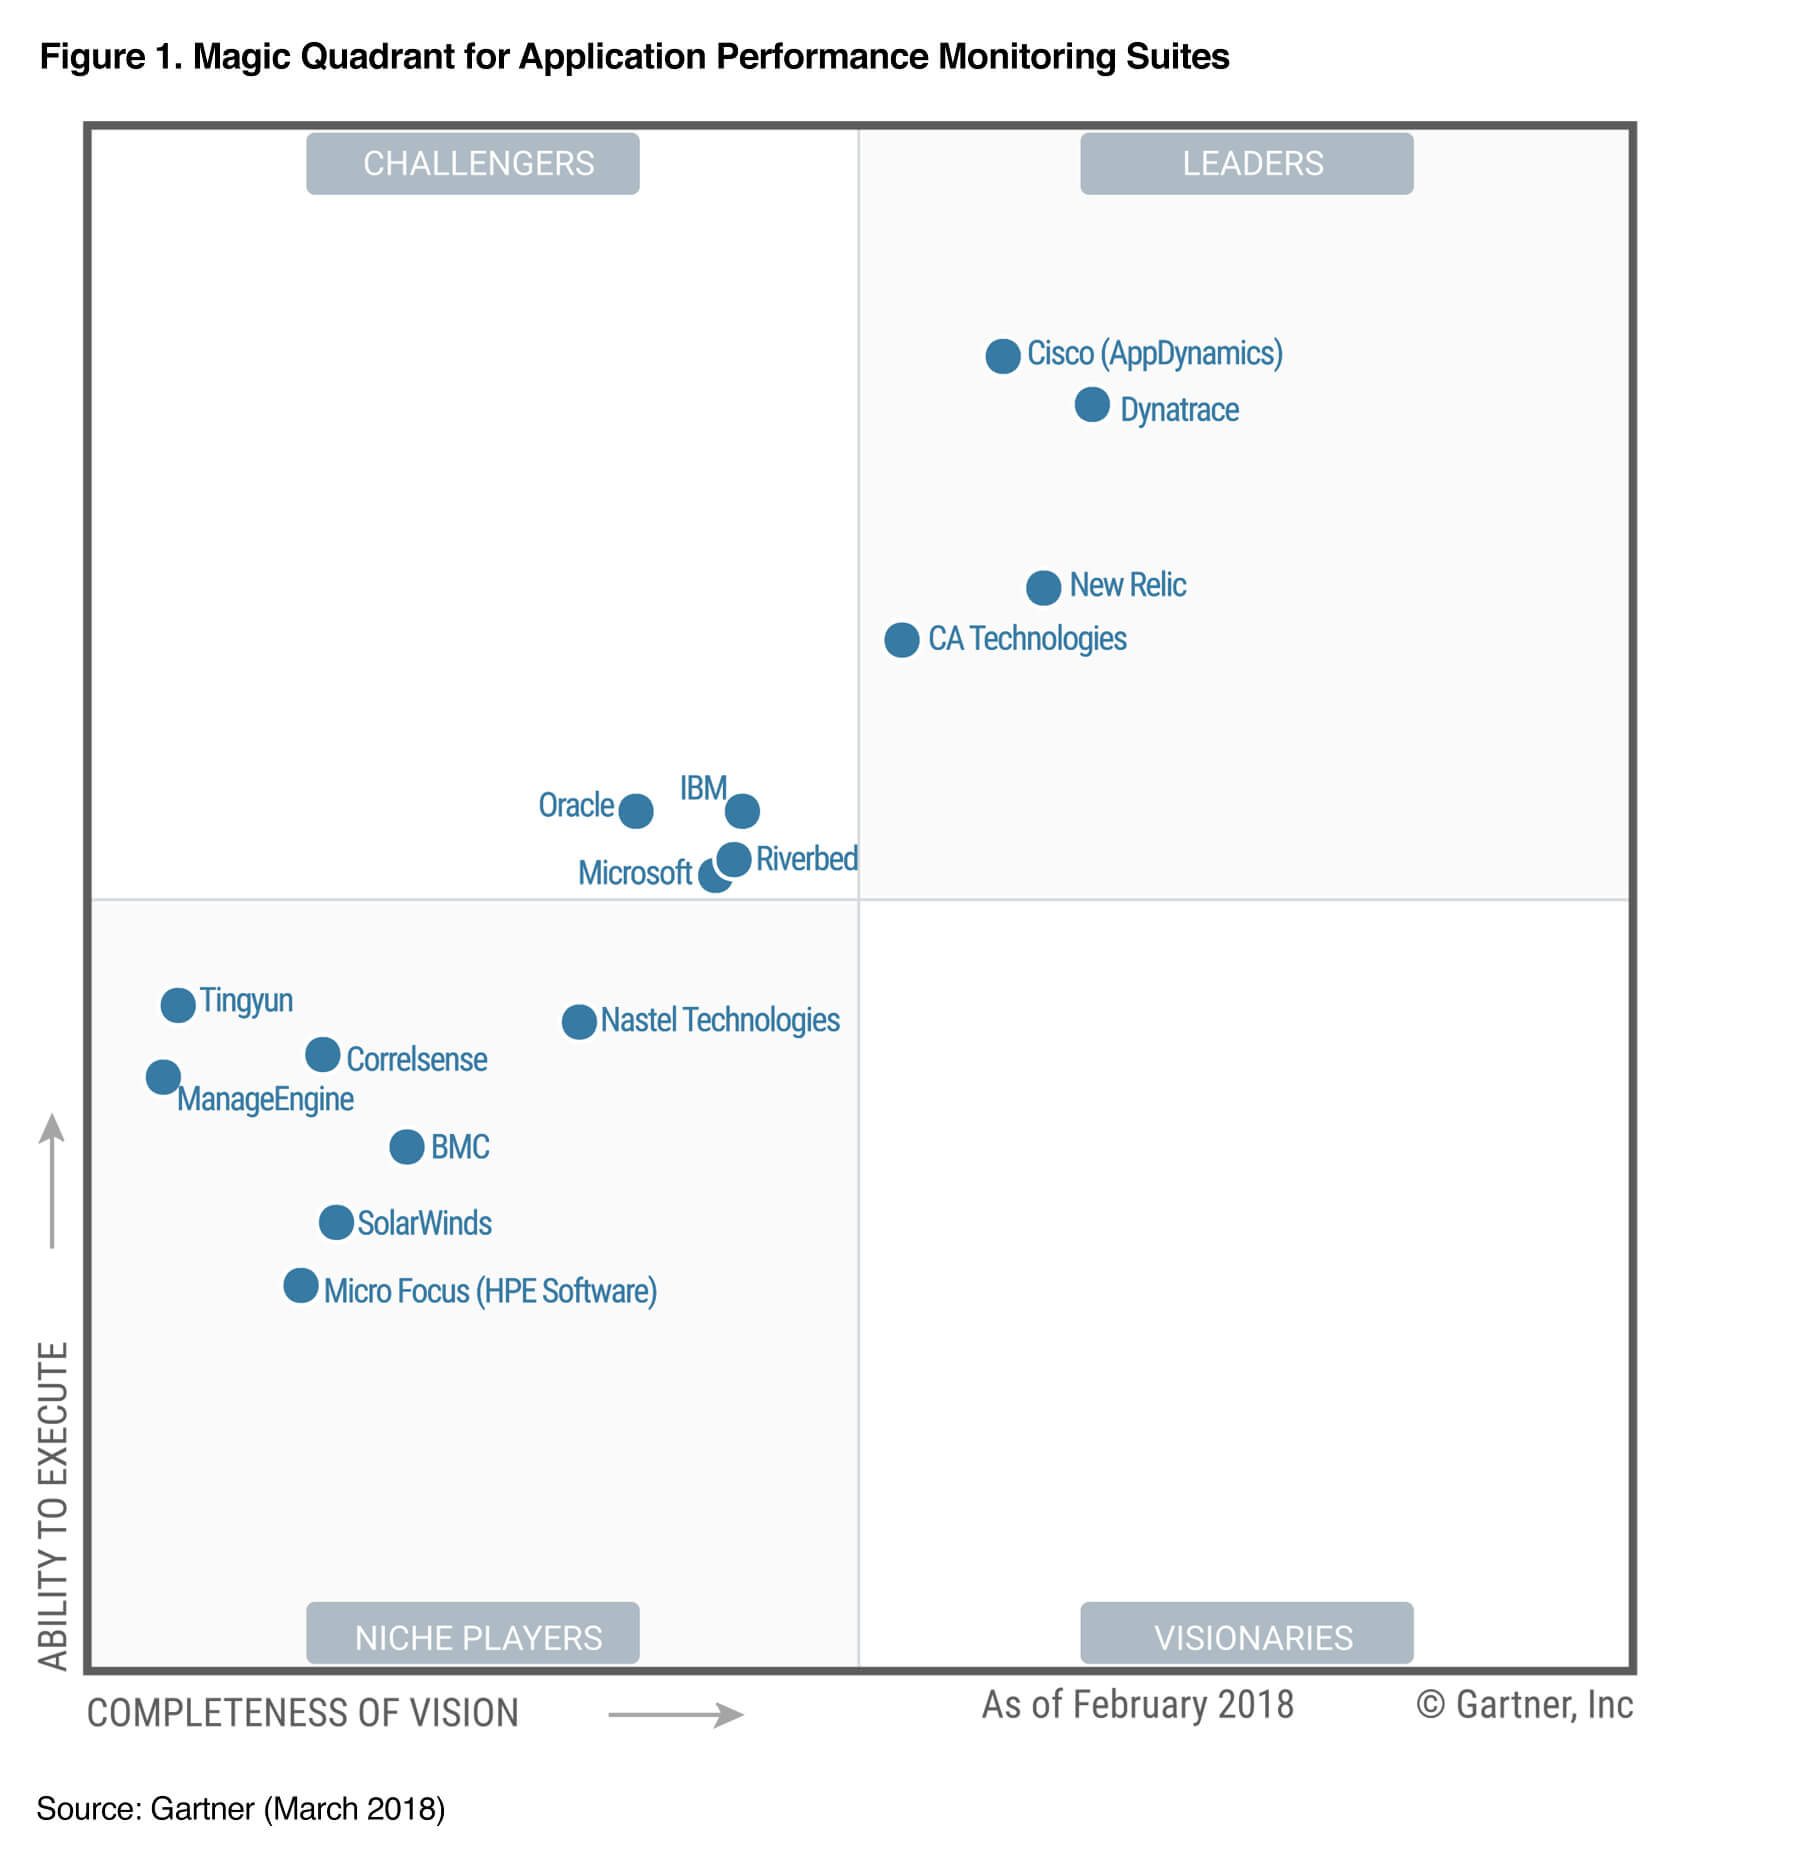 2019 Gartner Magic Quadrant for Application Performance Monitoring